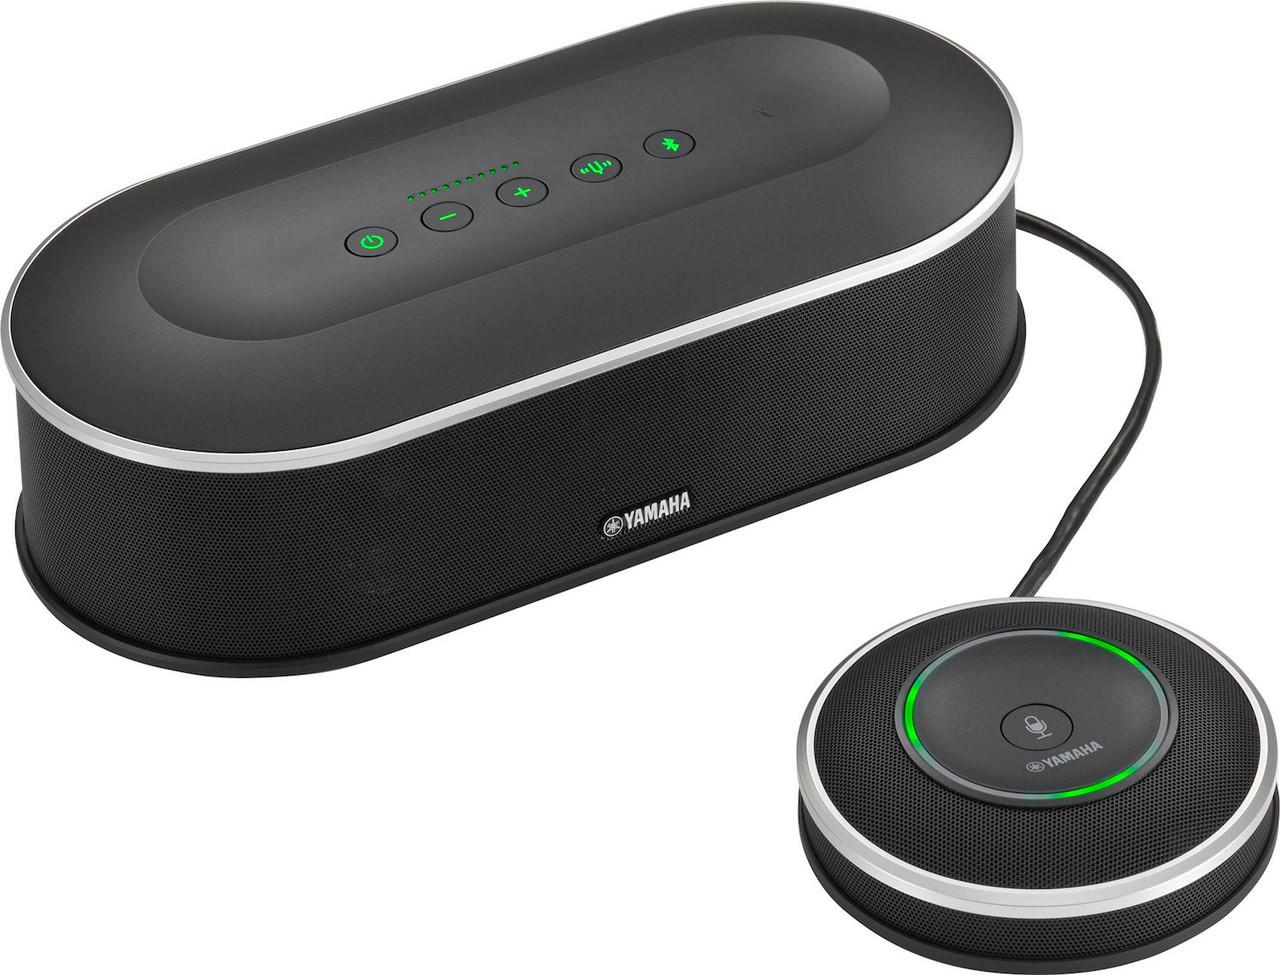 Yamaha YVC-1000 Unified Communications USB & Bluetooth Conference Phone System